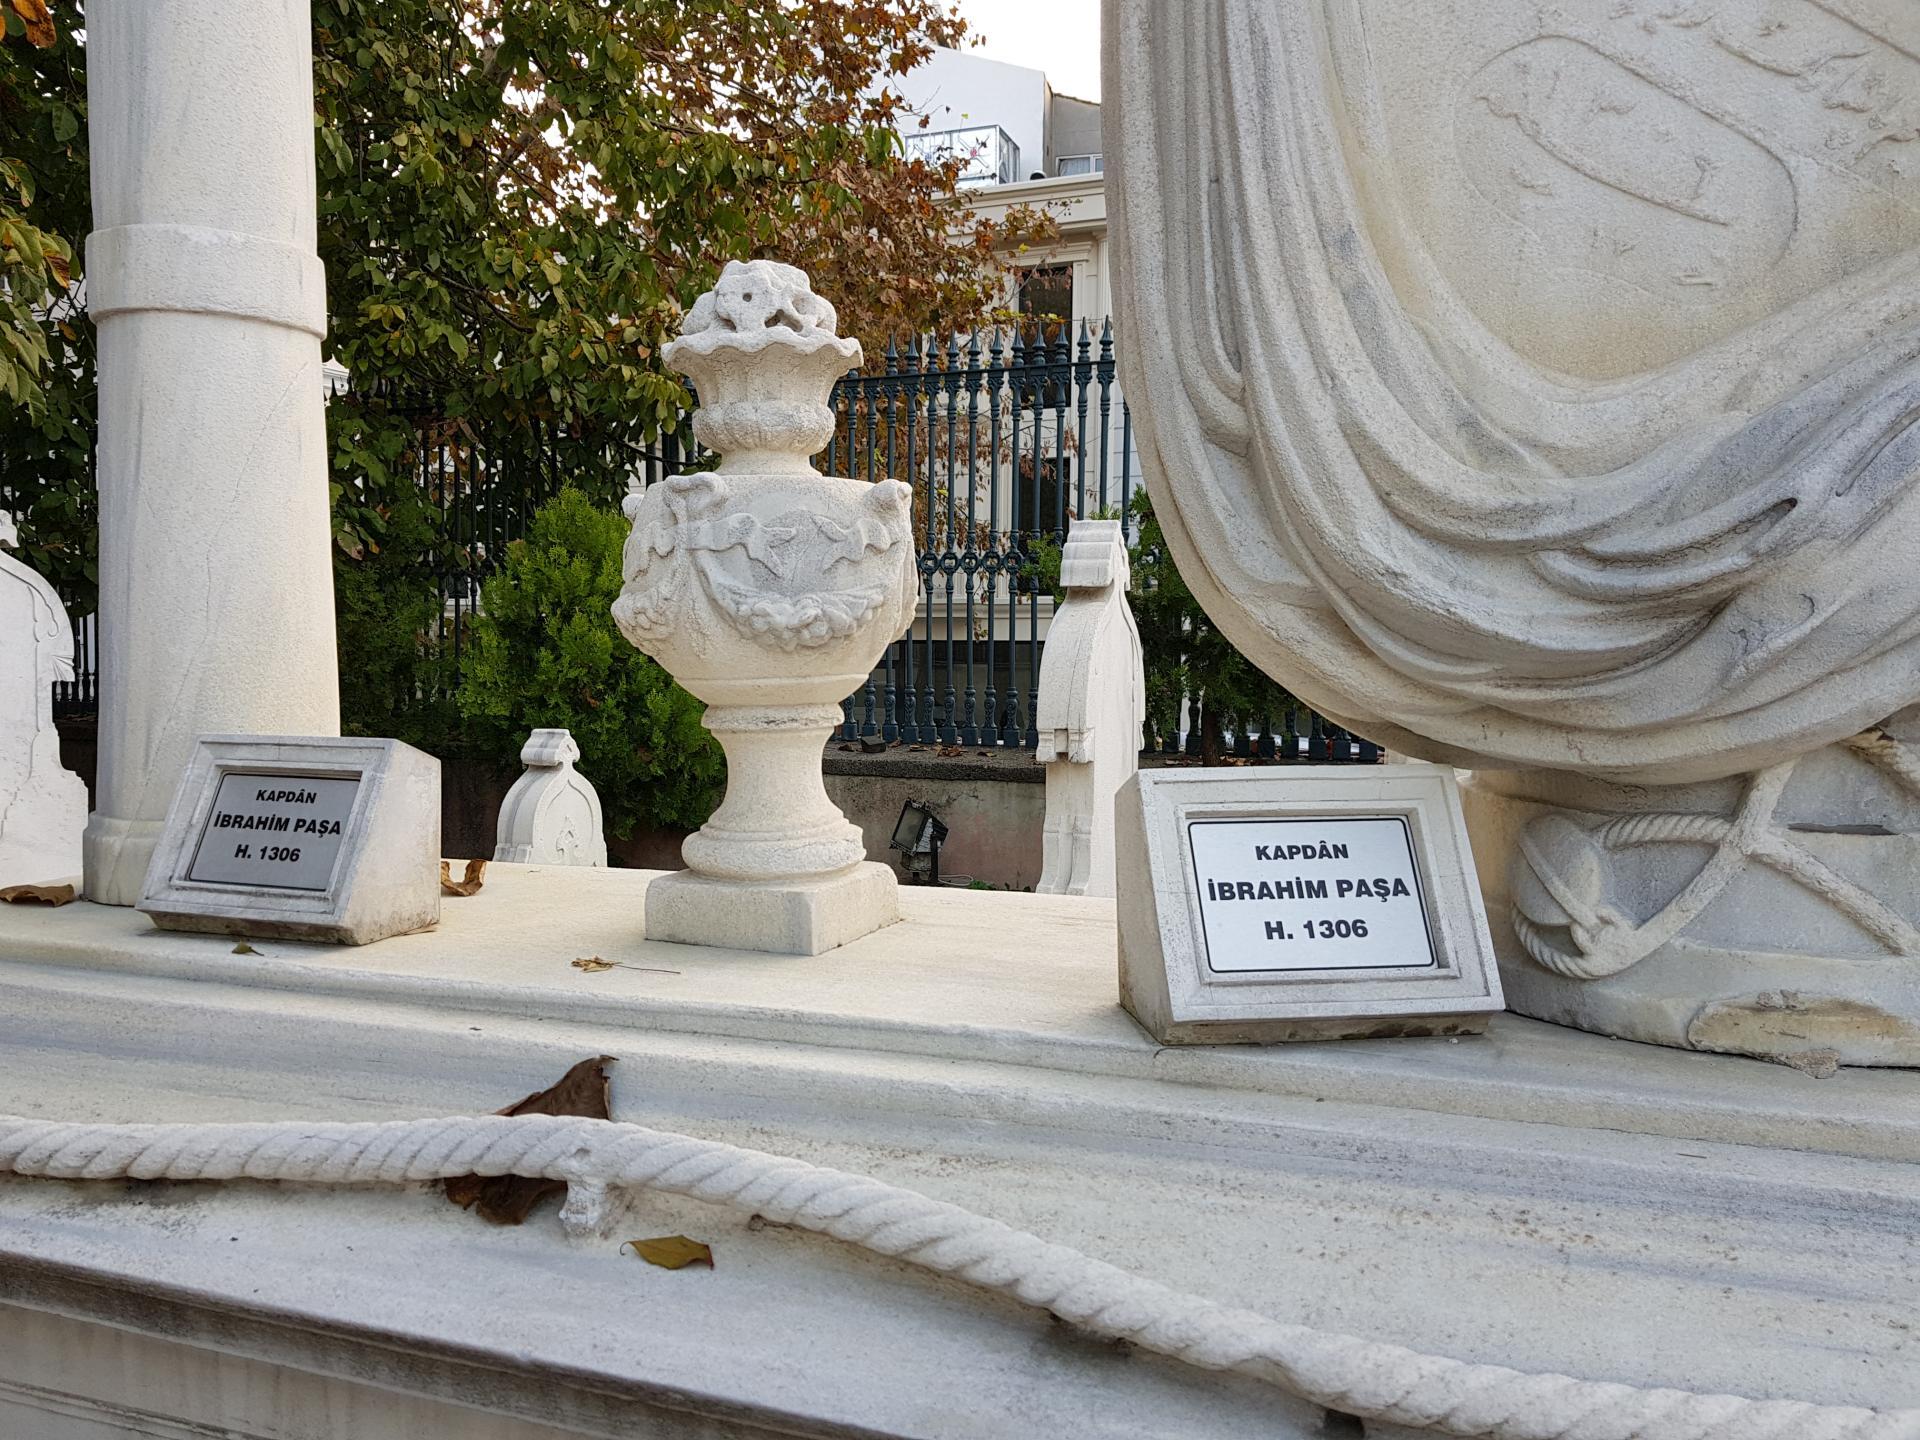 могилы турецких пашей, Стамбул